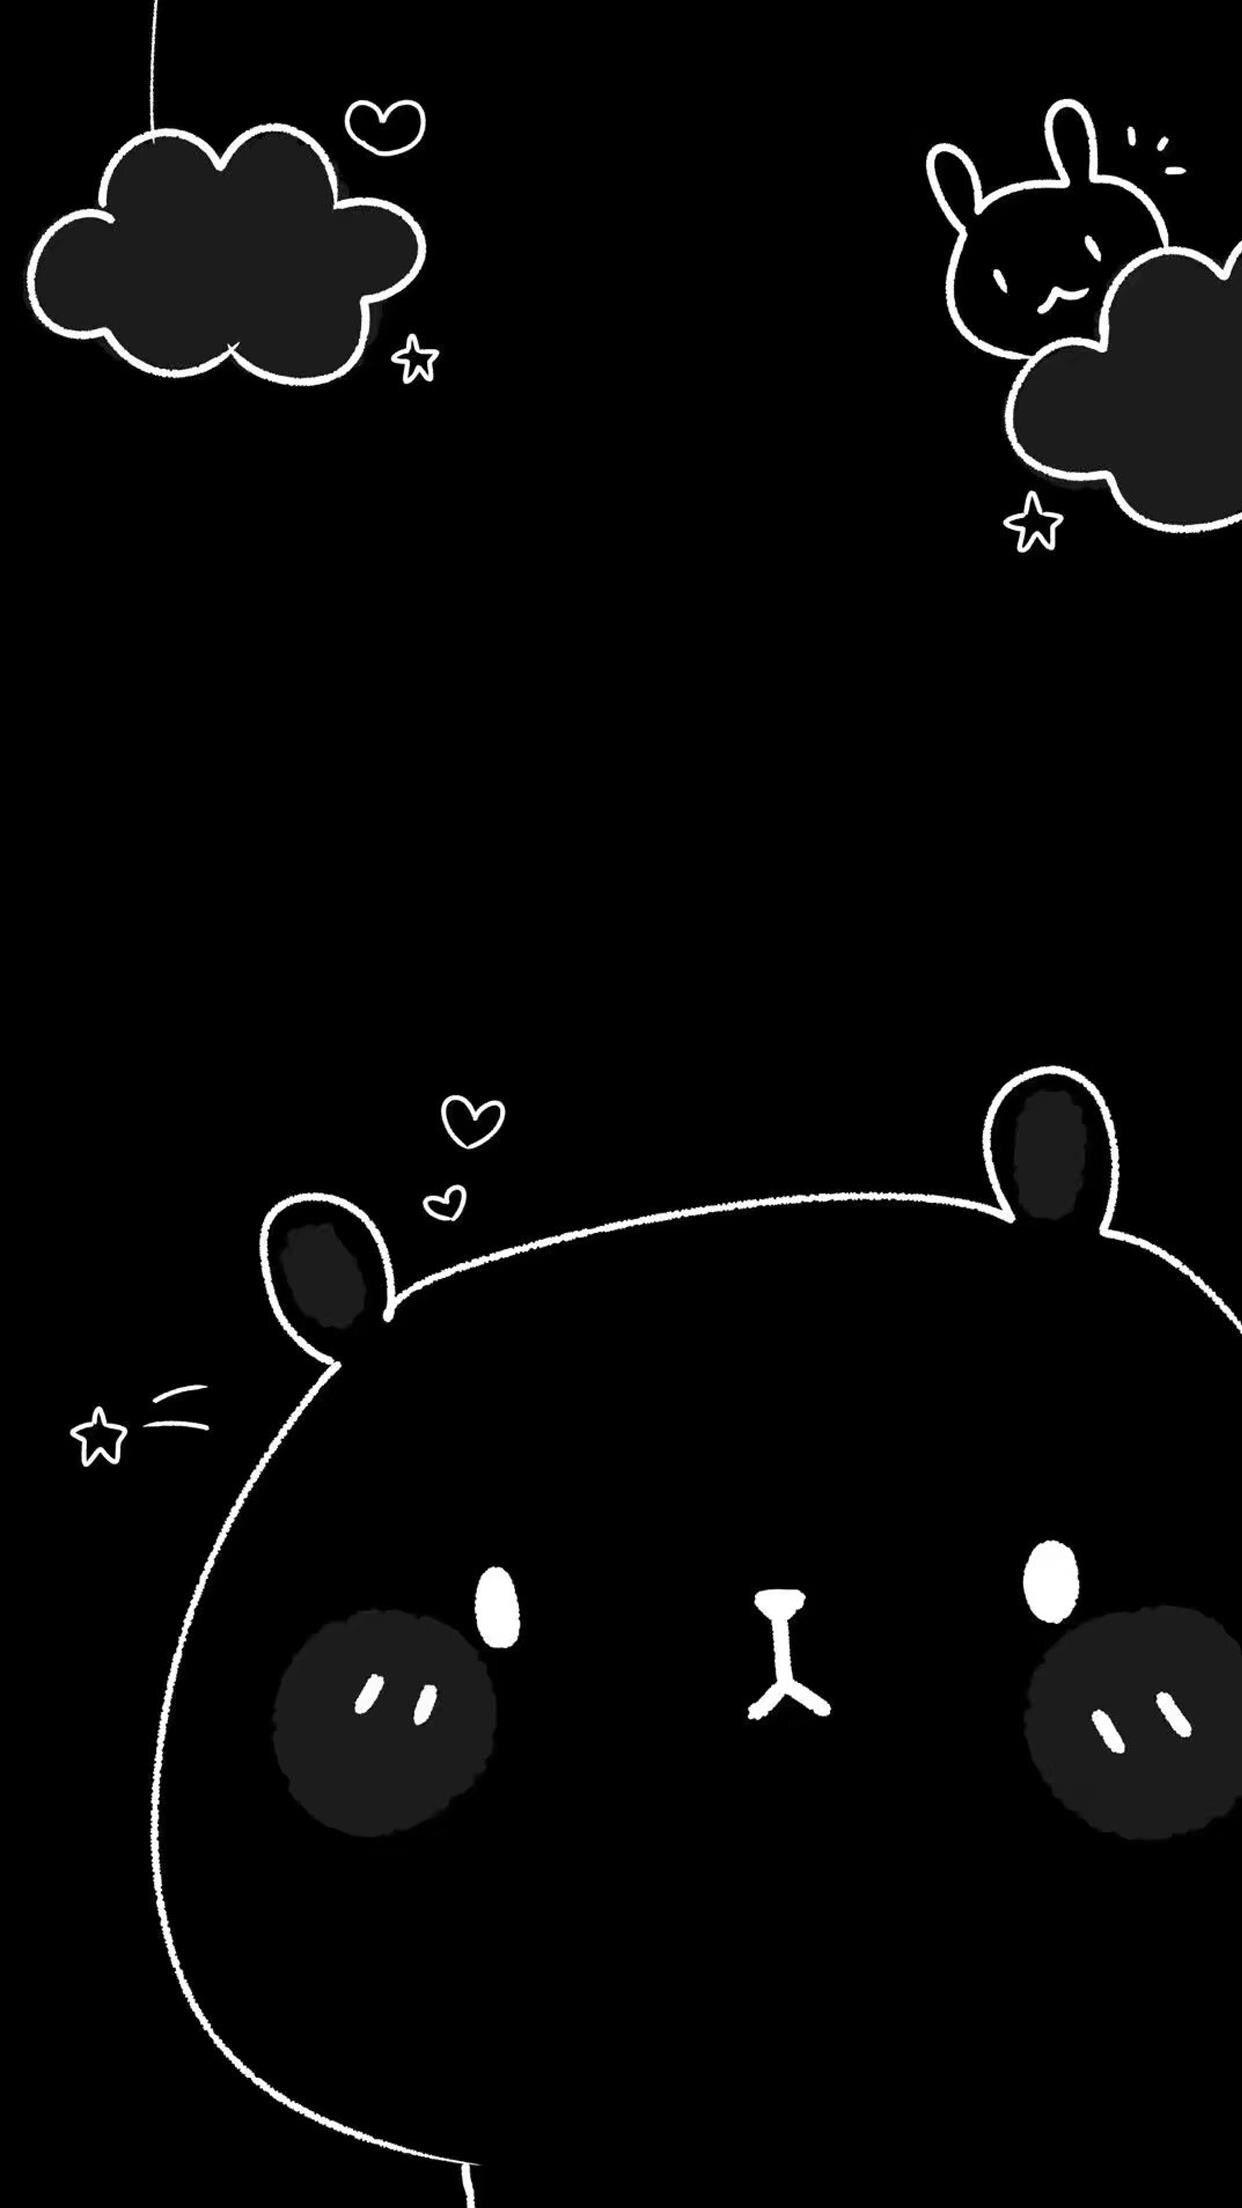 Pin By Sagitariussss On Hi Dark Wallpaper Iphone Wallpaper Iphone Cute Cute Wallpapers